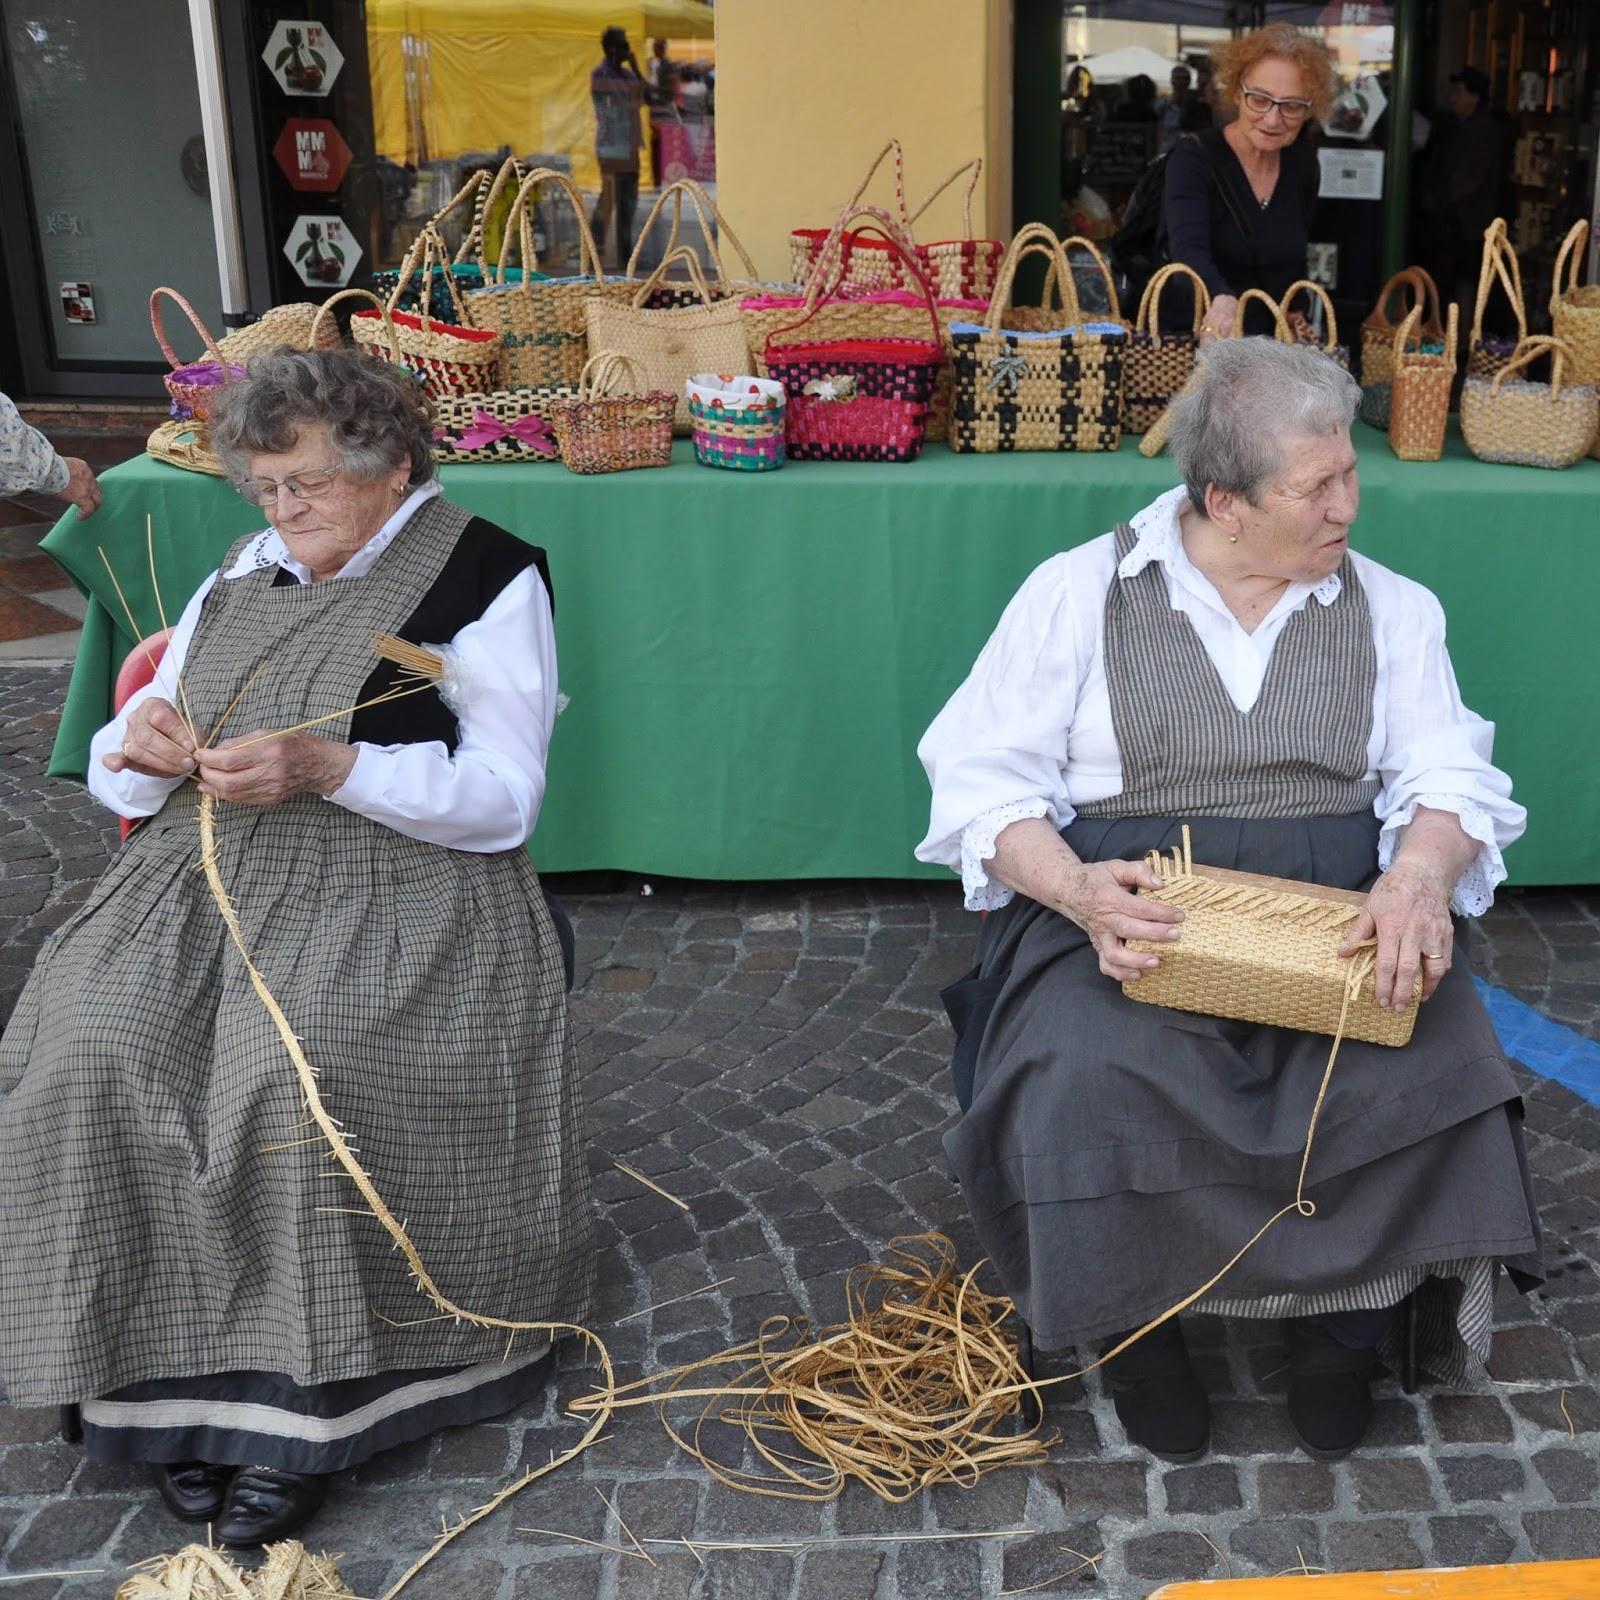 Old ladies weave bags, Cherry Show Market, Marostica, Veneto, Italy